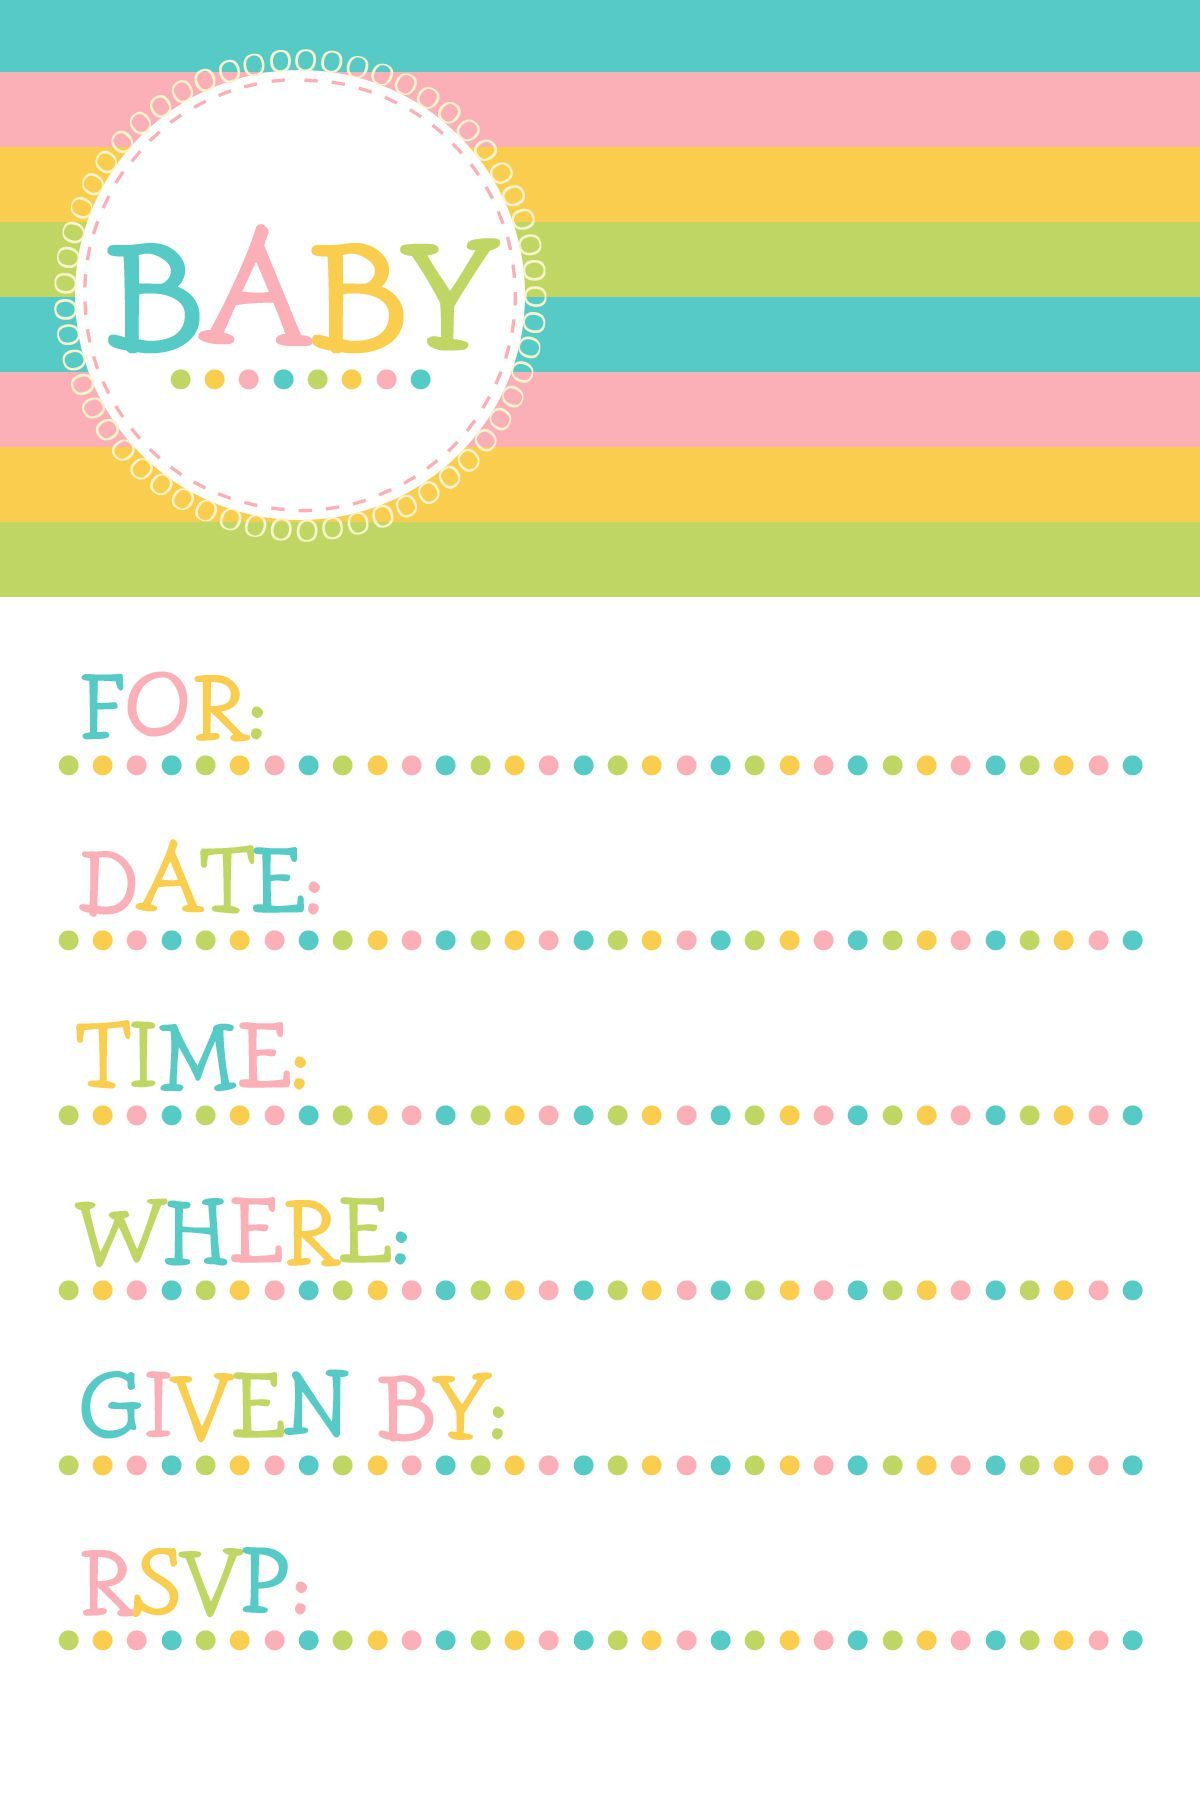 25 Adorable Free Printable Baby Shower Invitations - Baby Invitations Printable Free